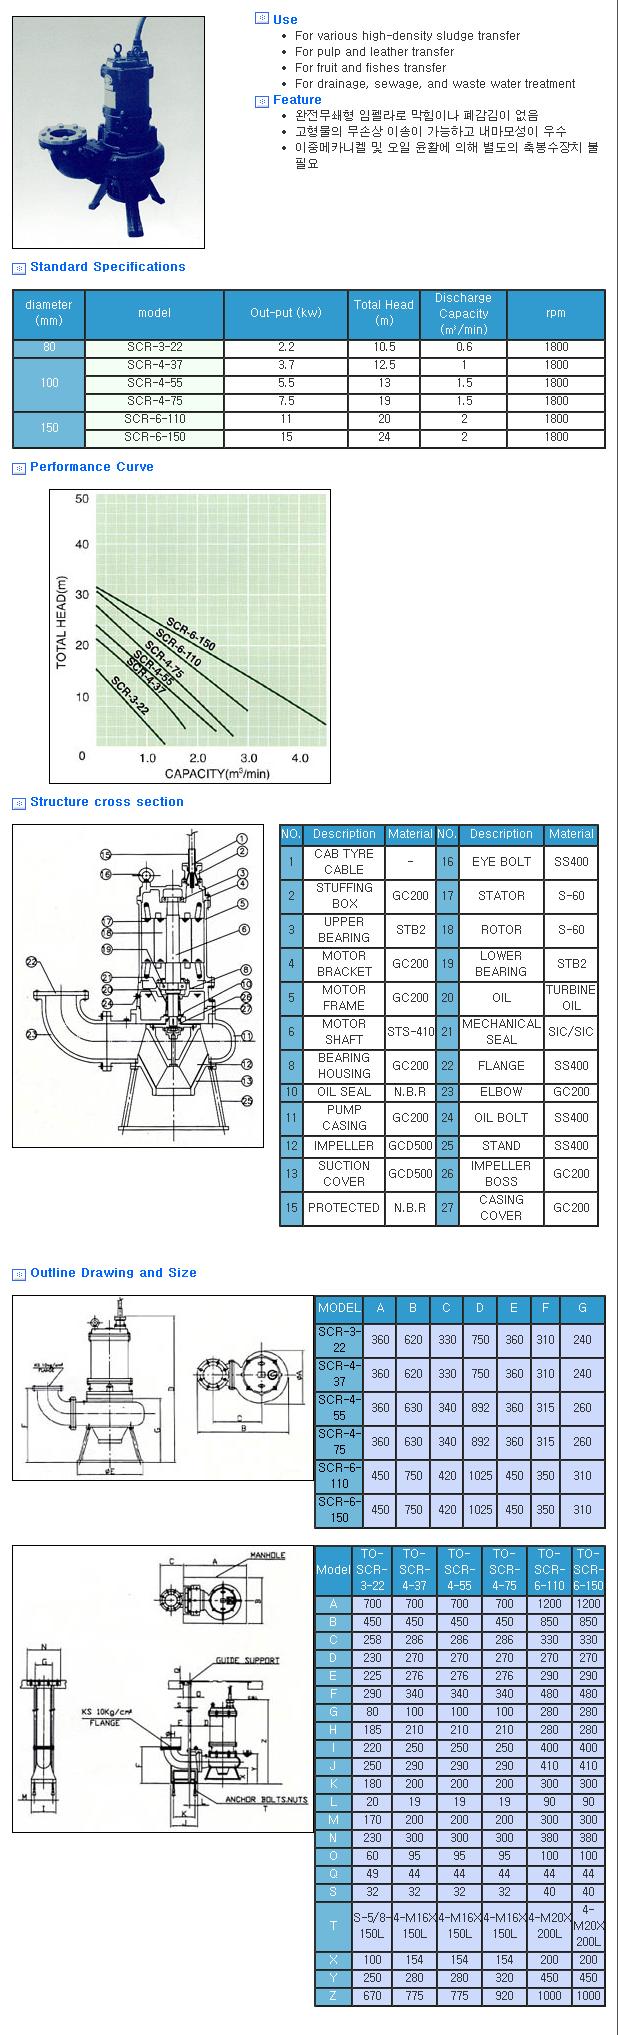 Shinshin Pump Manufacturing Co. Screw Pump SCR